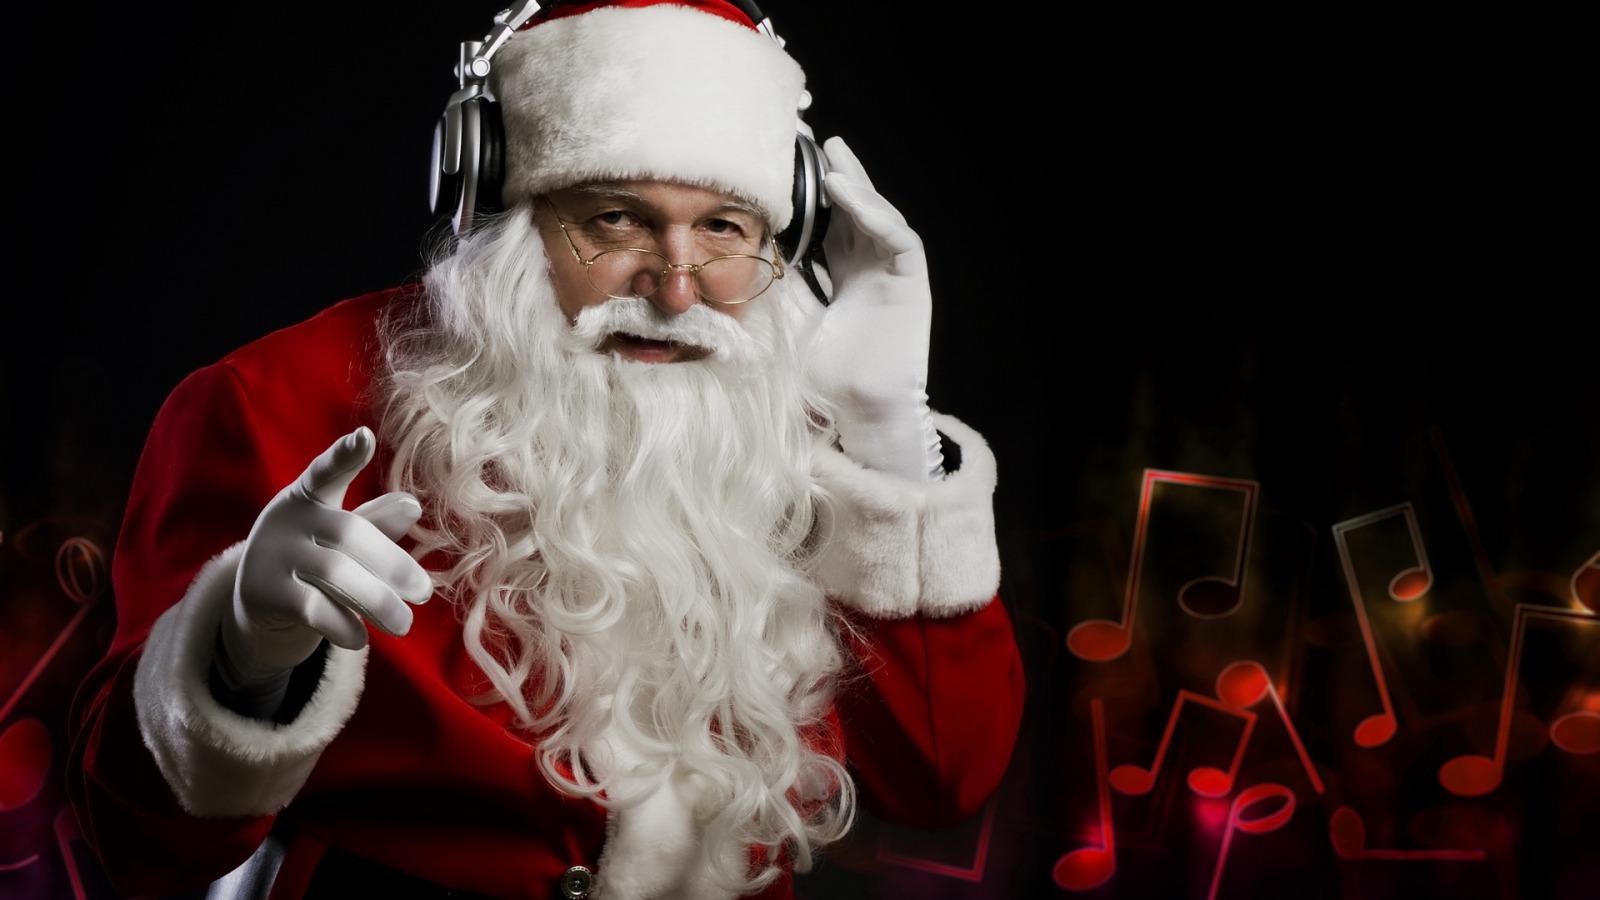 - скачивай на телефон песни и слушай бесплатно mp3 онлайн.